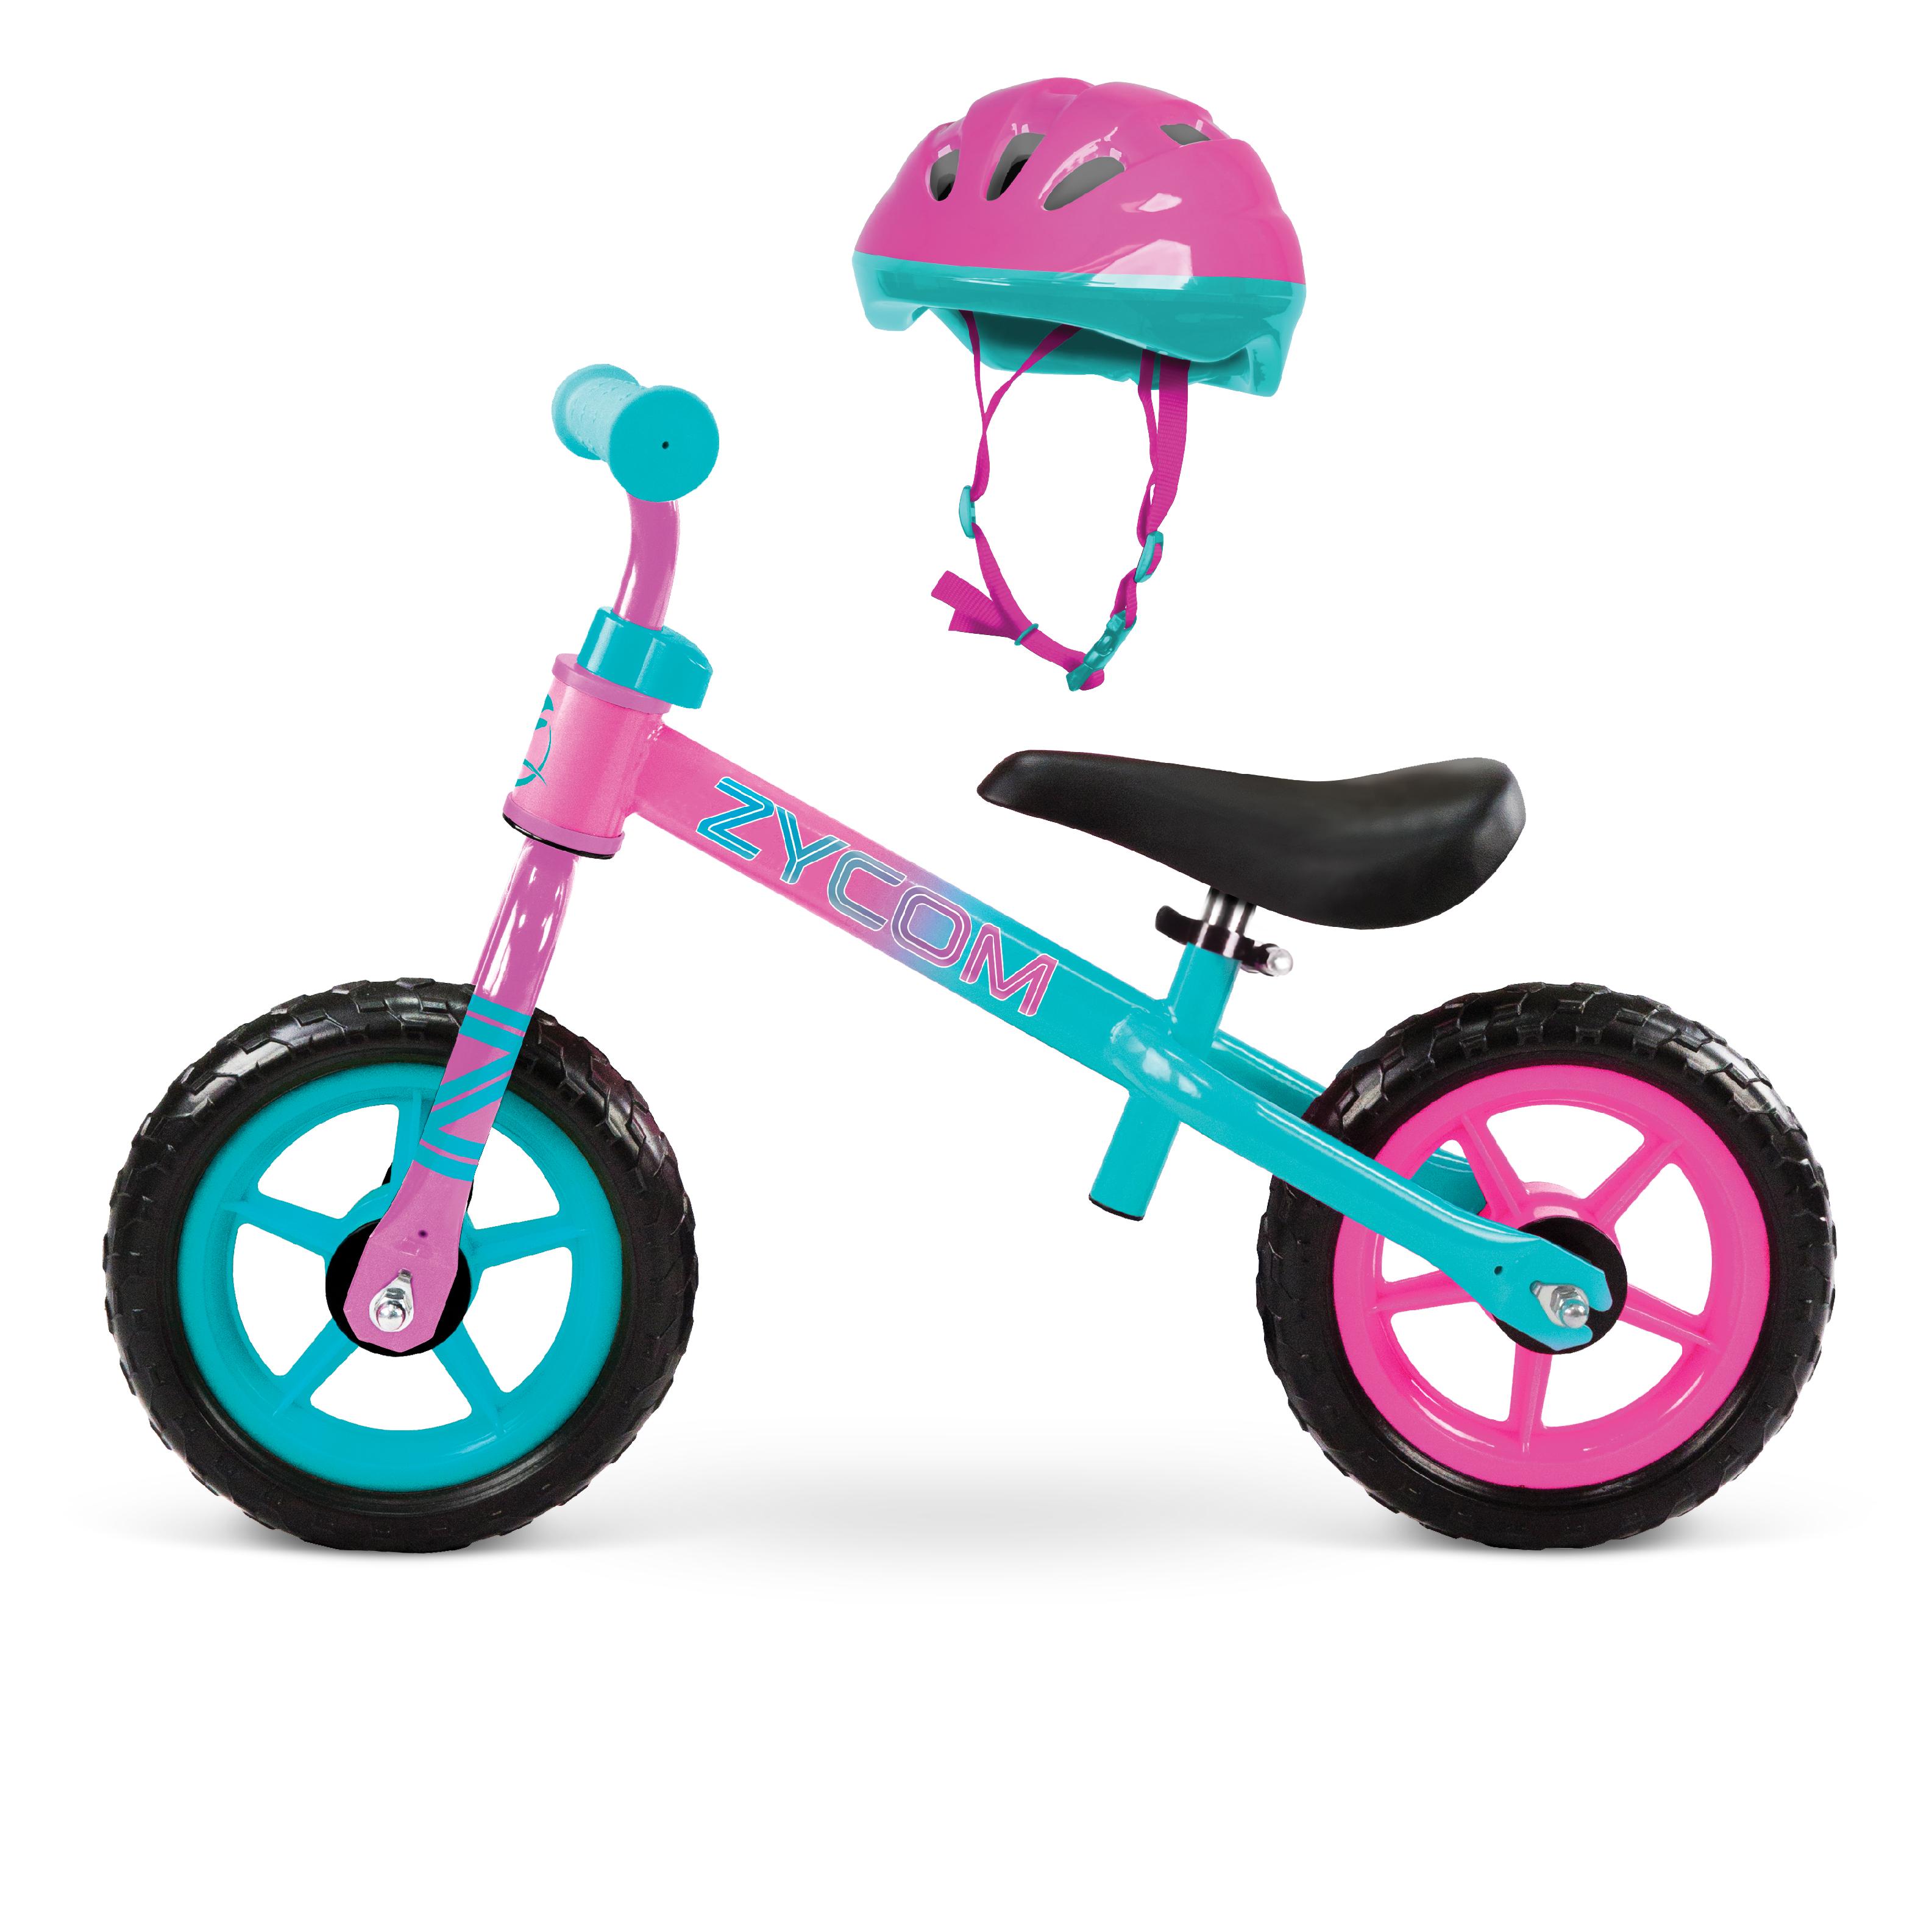 "10"" Zycom My 1st Balance Bike w/ Helmet (Teal/Pink) or (Blue/Green) $30 + Free S&H on $35"